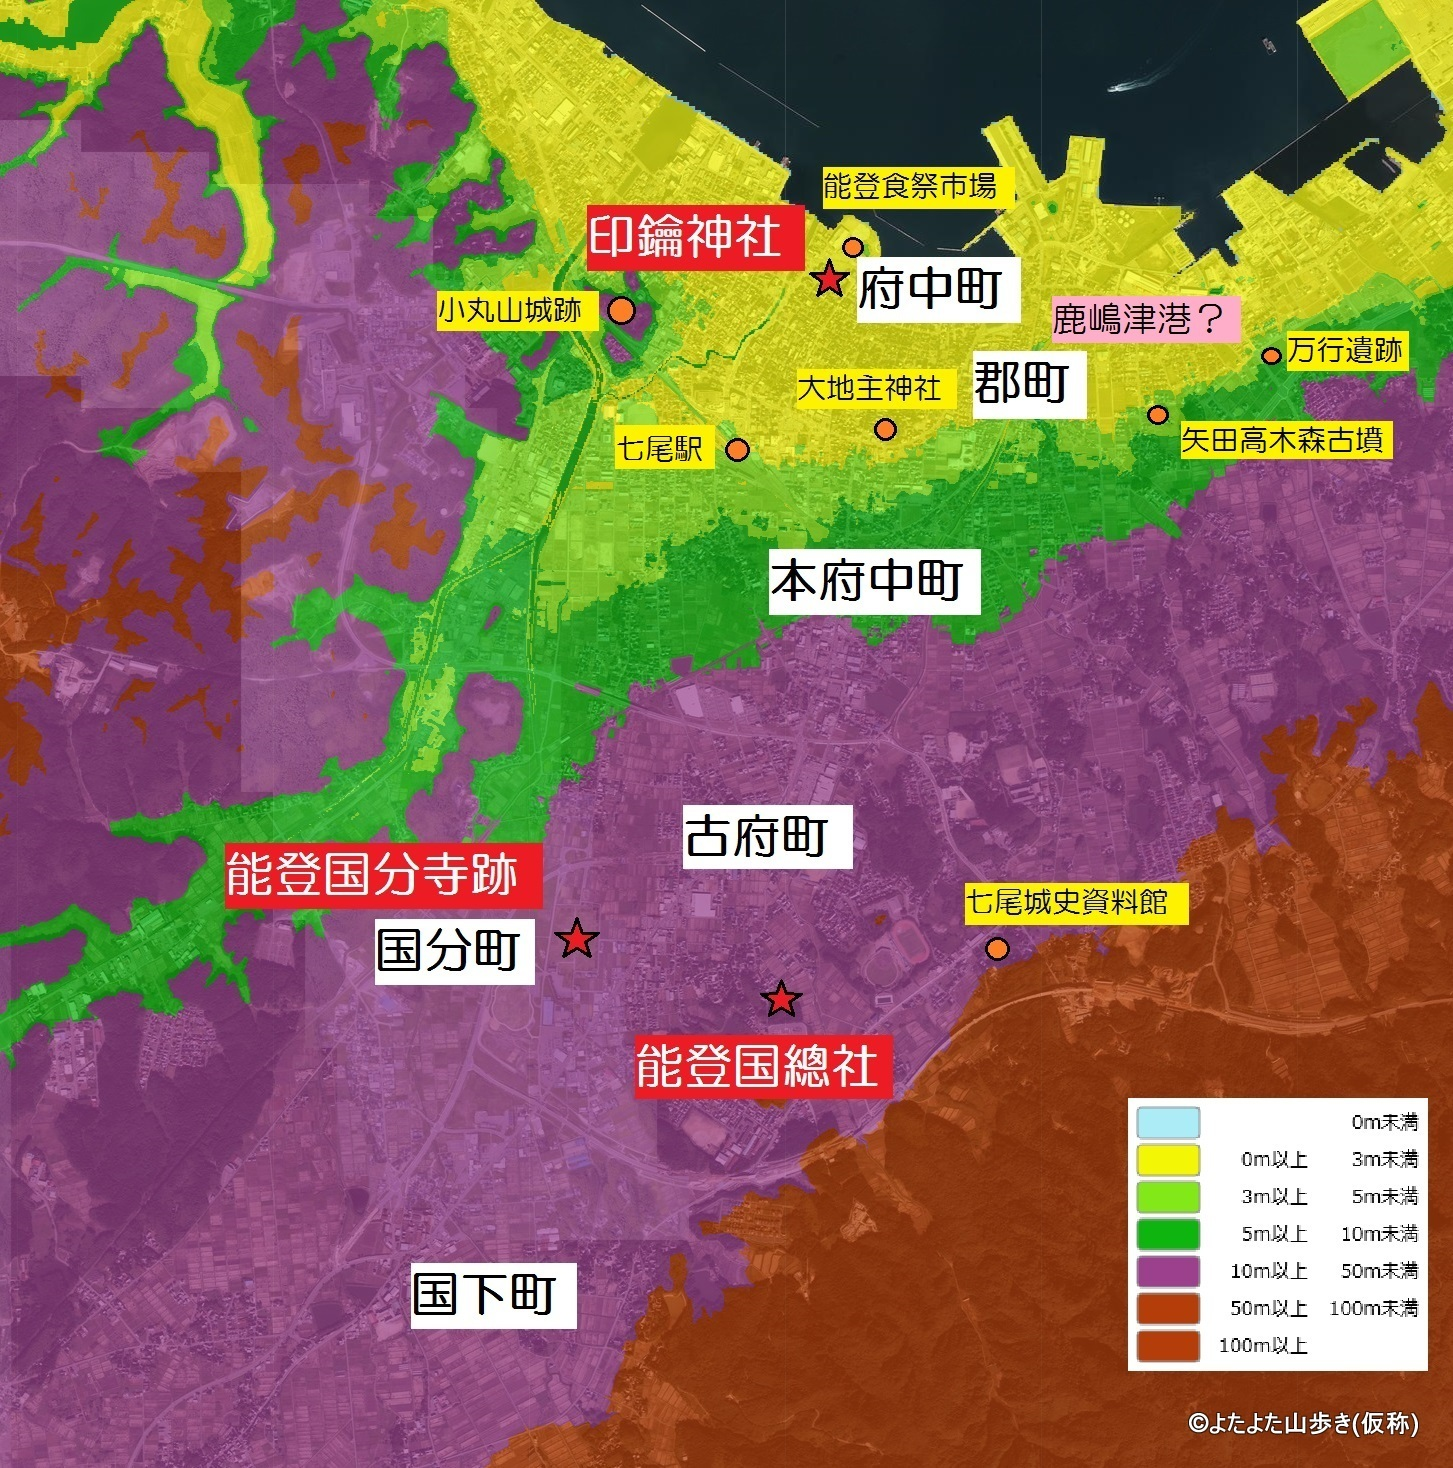 nanao_map03c-001.jpg